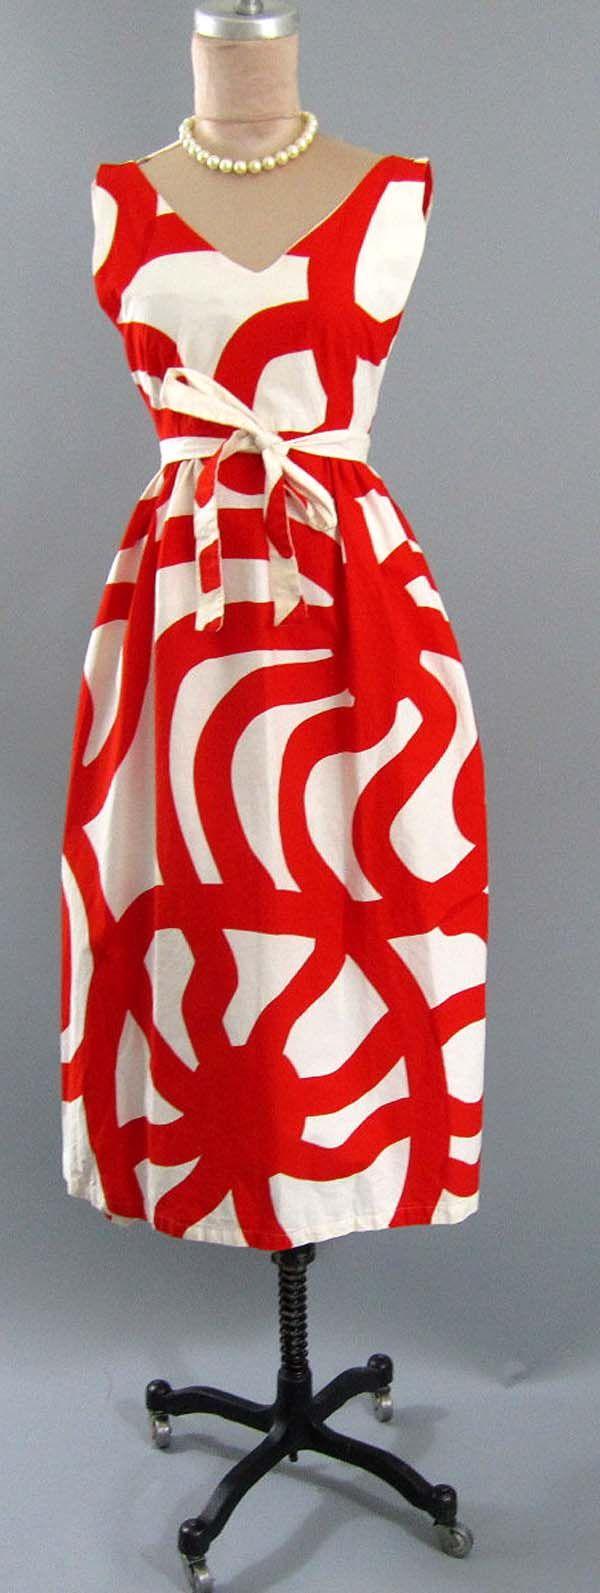 Vintage 60s Joonas 64 Marimekko Fabric Mod Christmas One of A Kind Wrap Dress   eBay